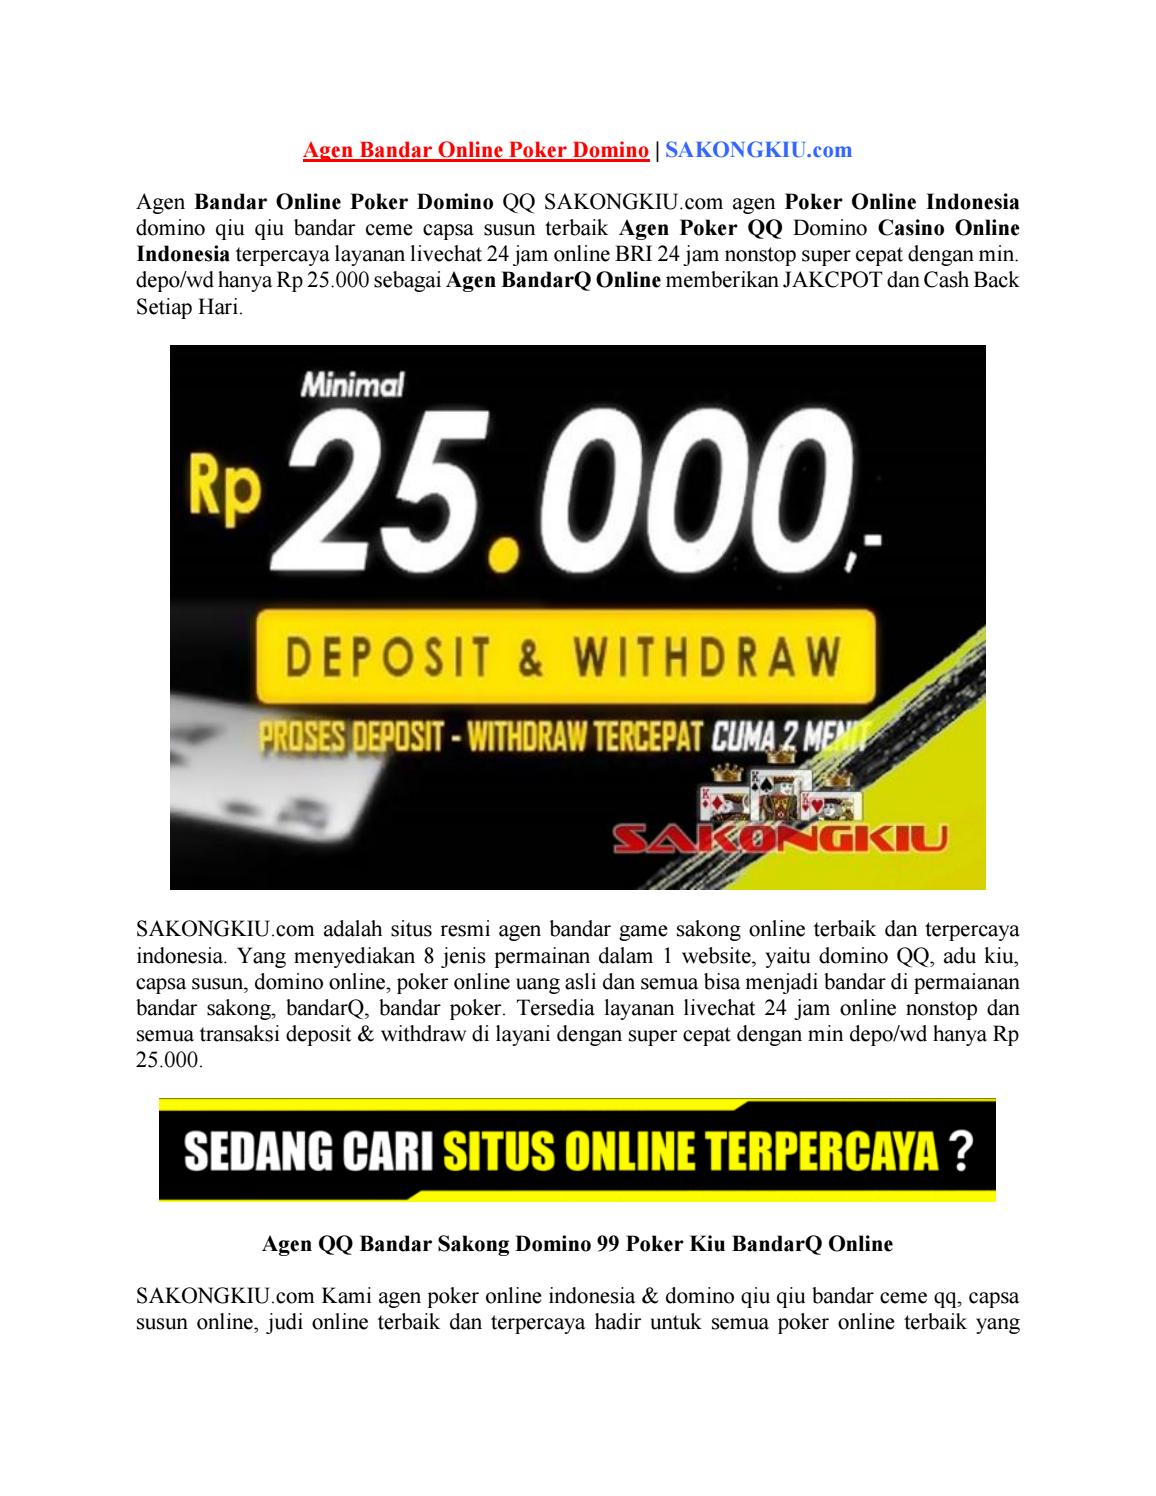 Agen Bandar Online Poker Domino Sakongkiu Com By Situs Judi Online Issuu